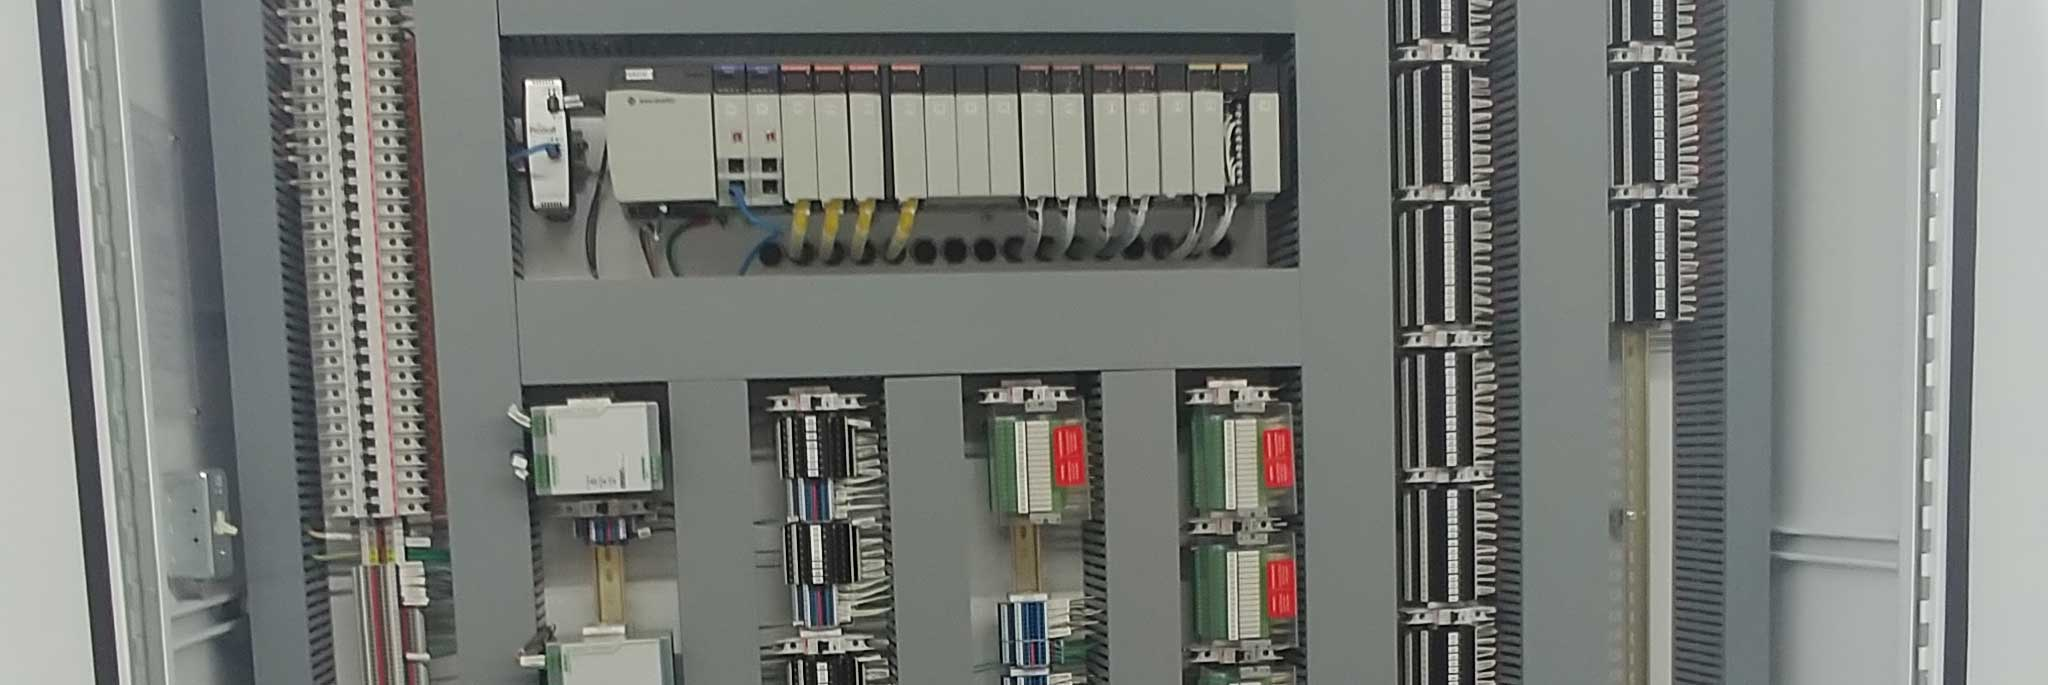 City of Ottawa control panel